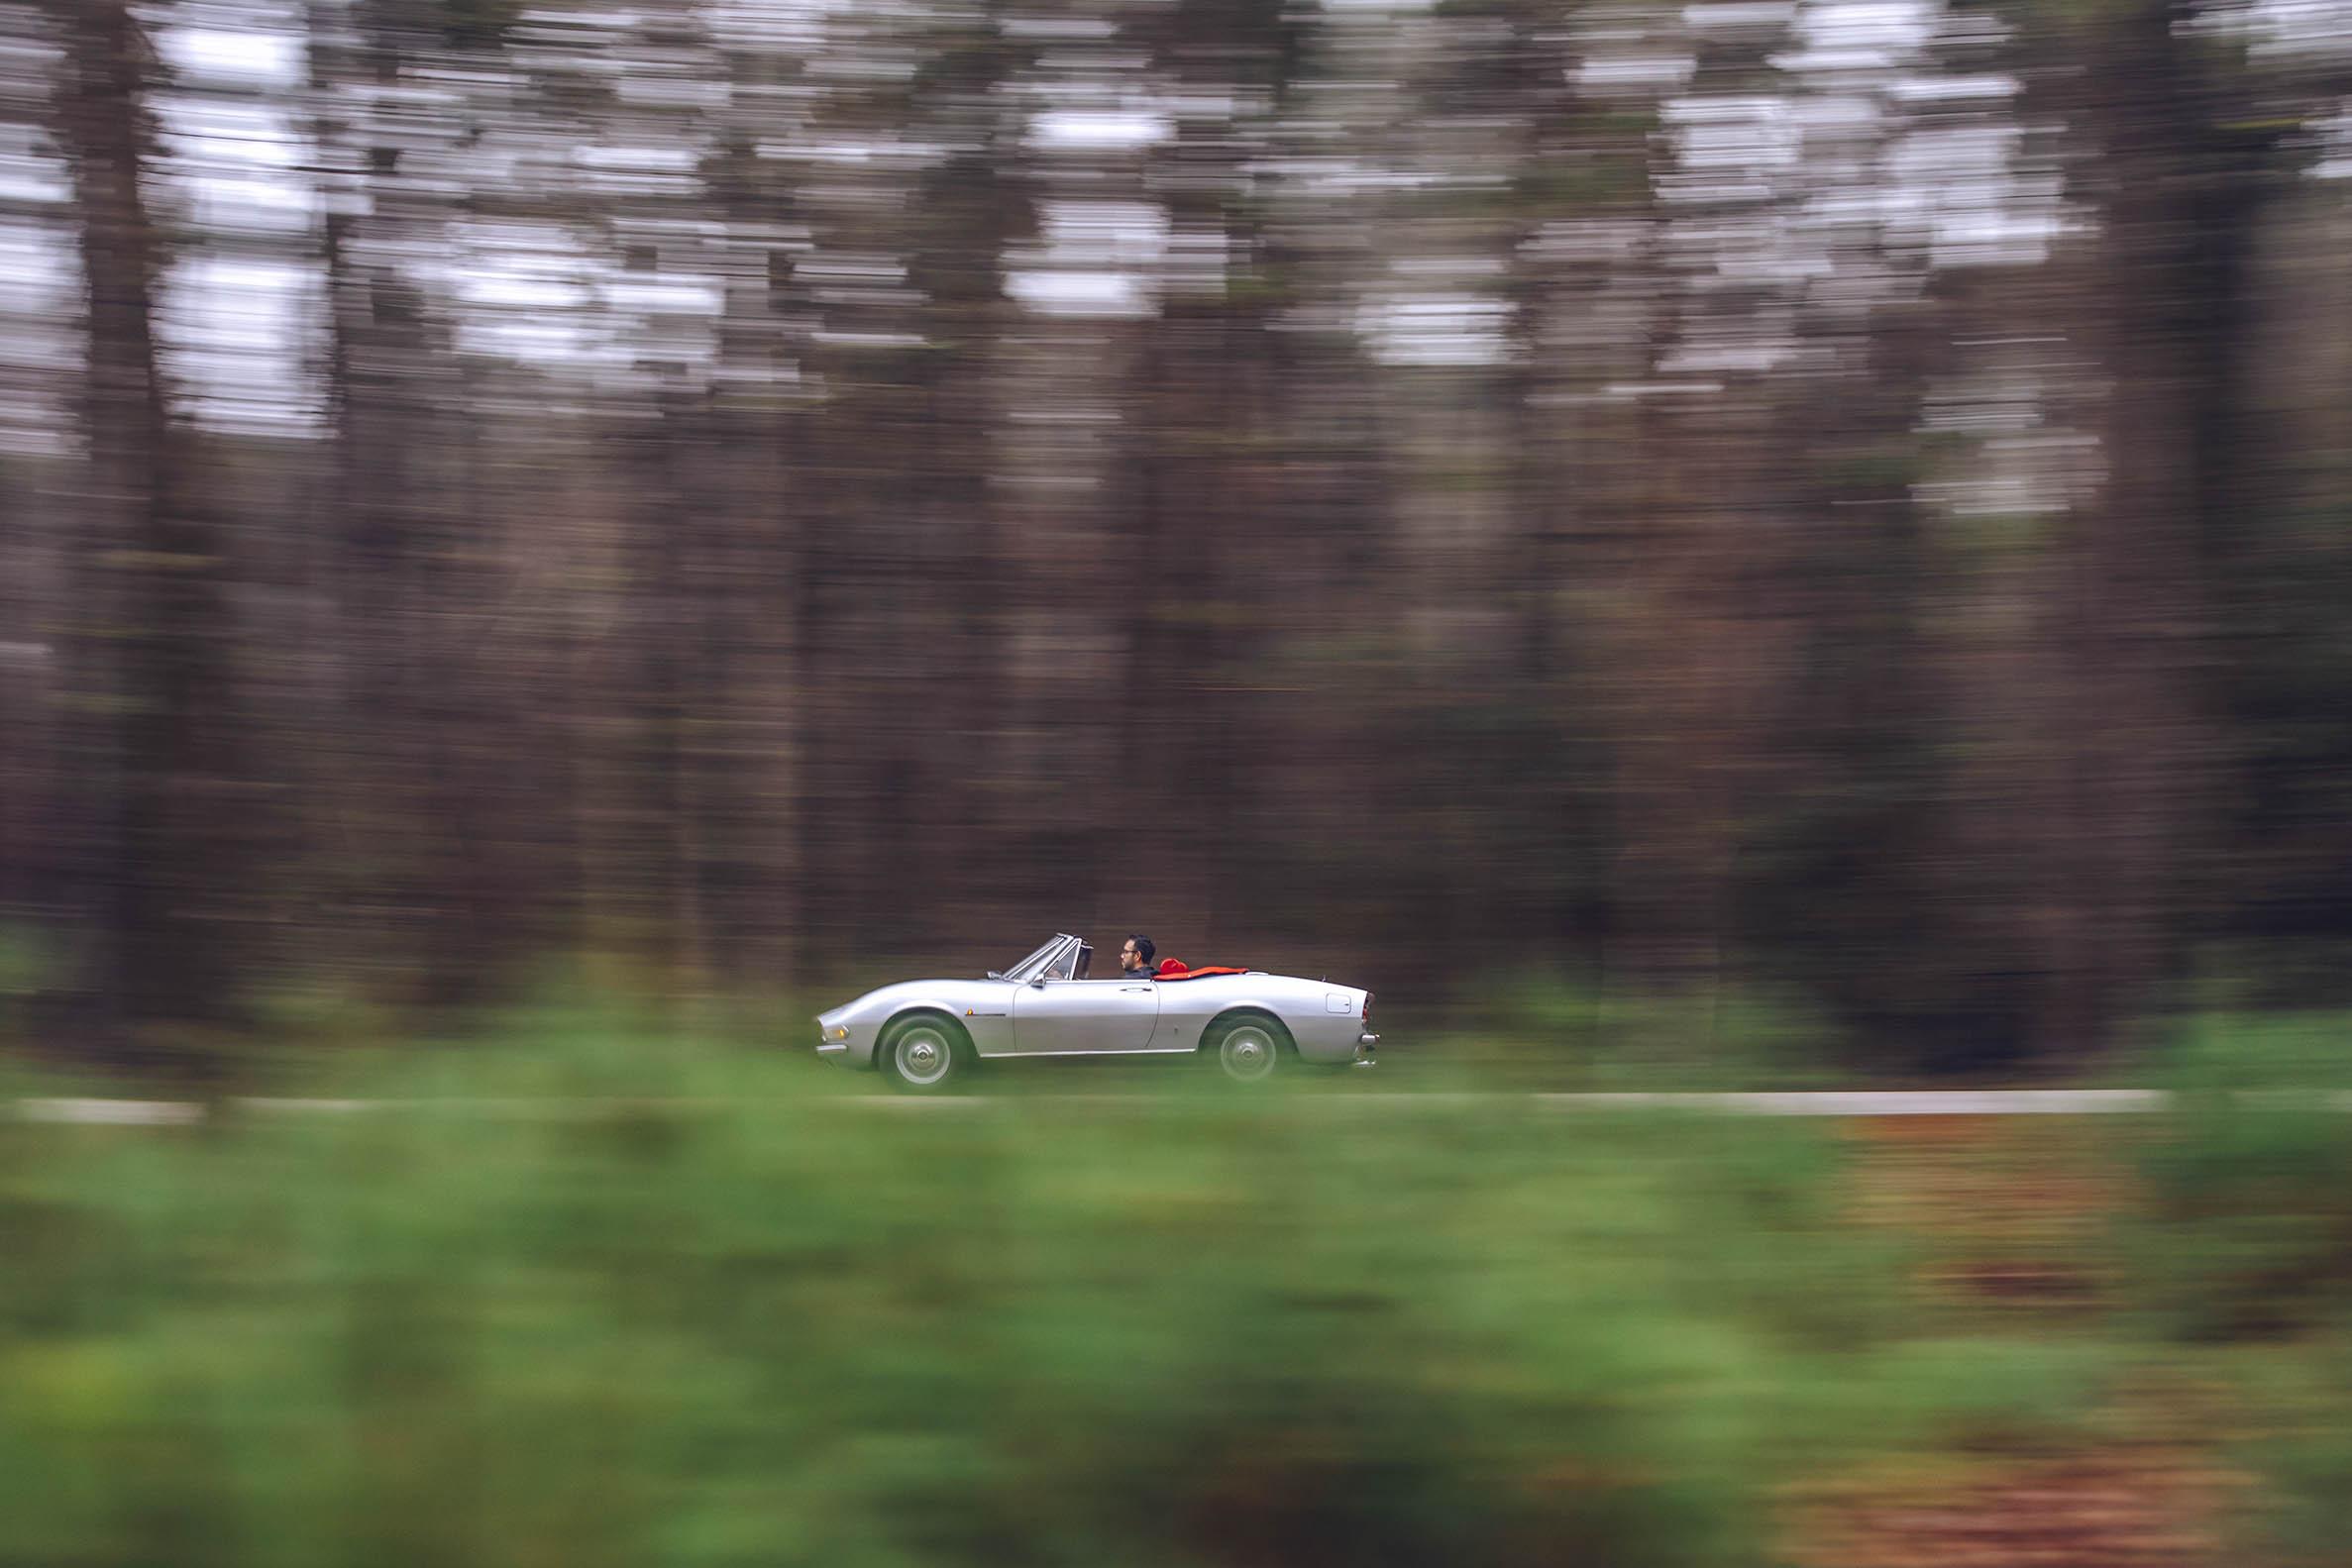 1970 Fiat Dino 2400 Spider driving